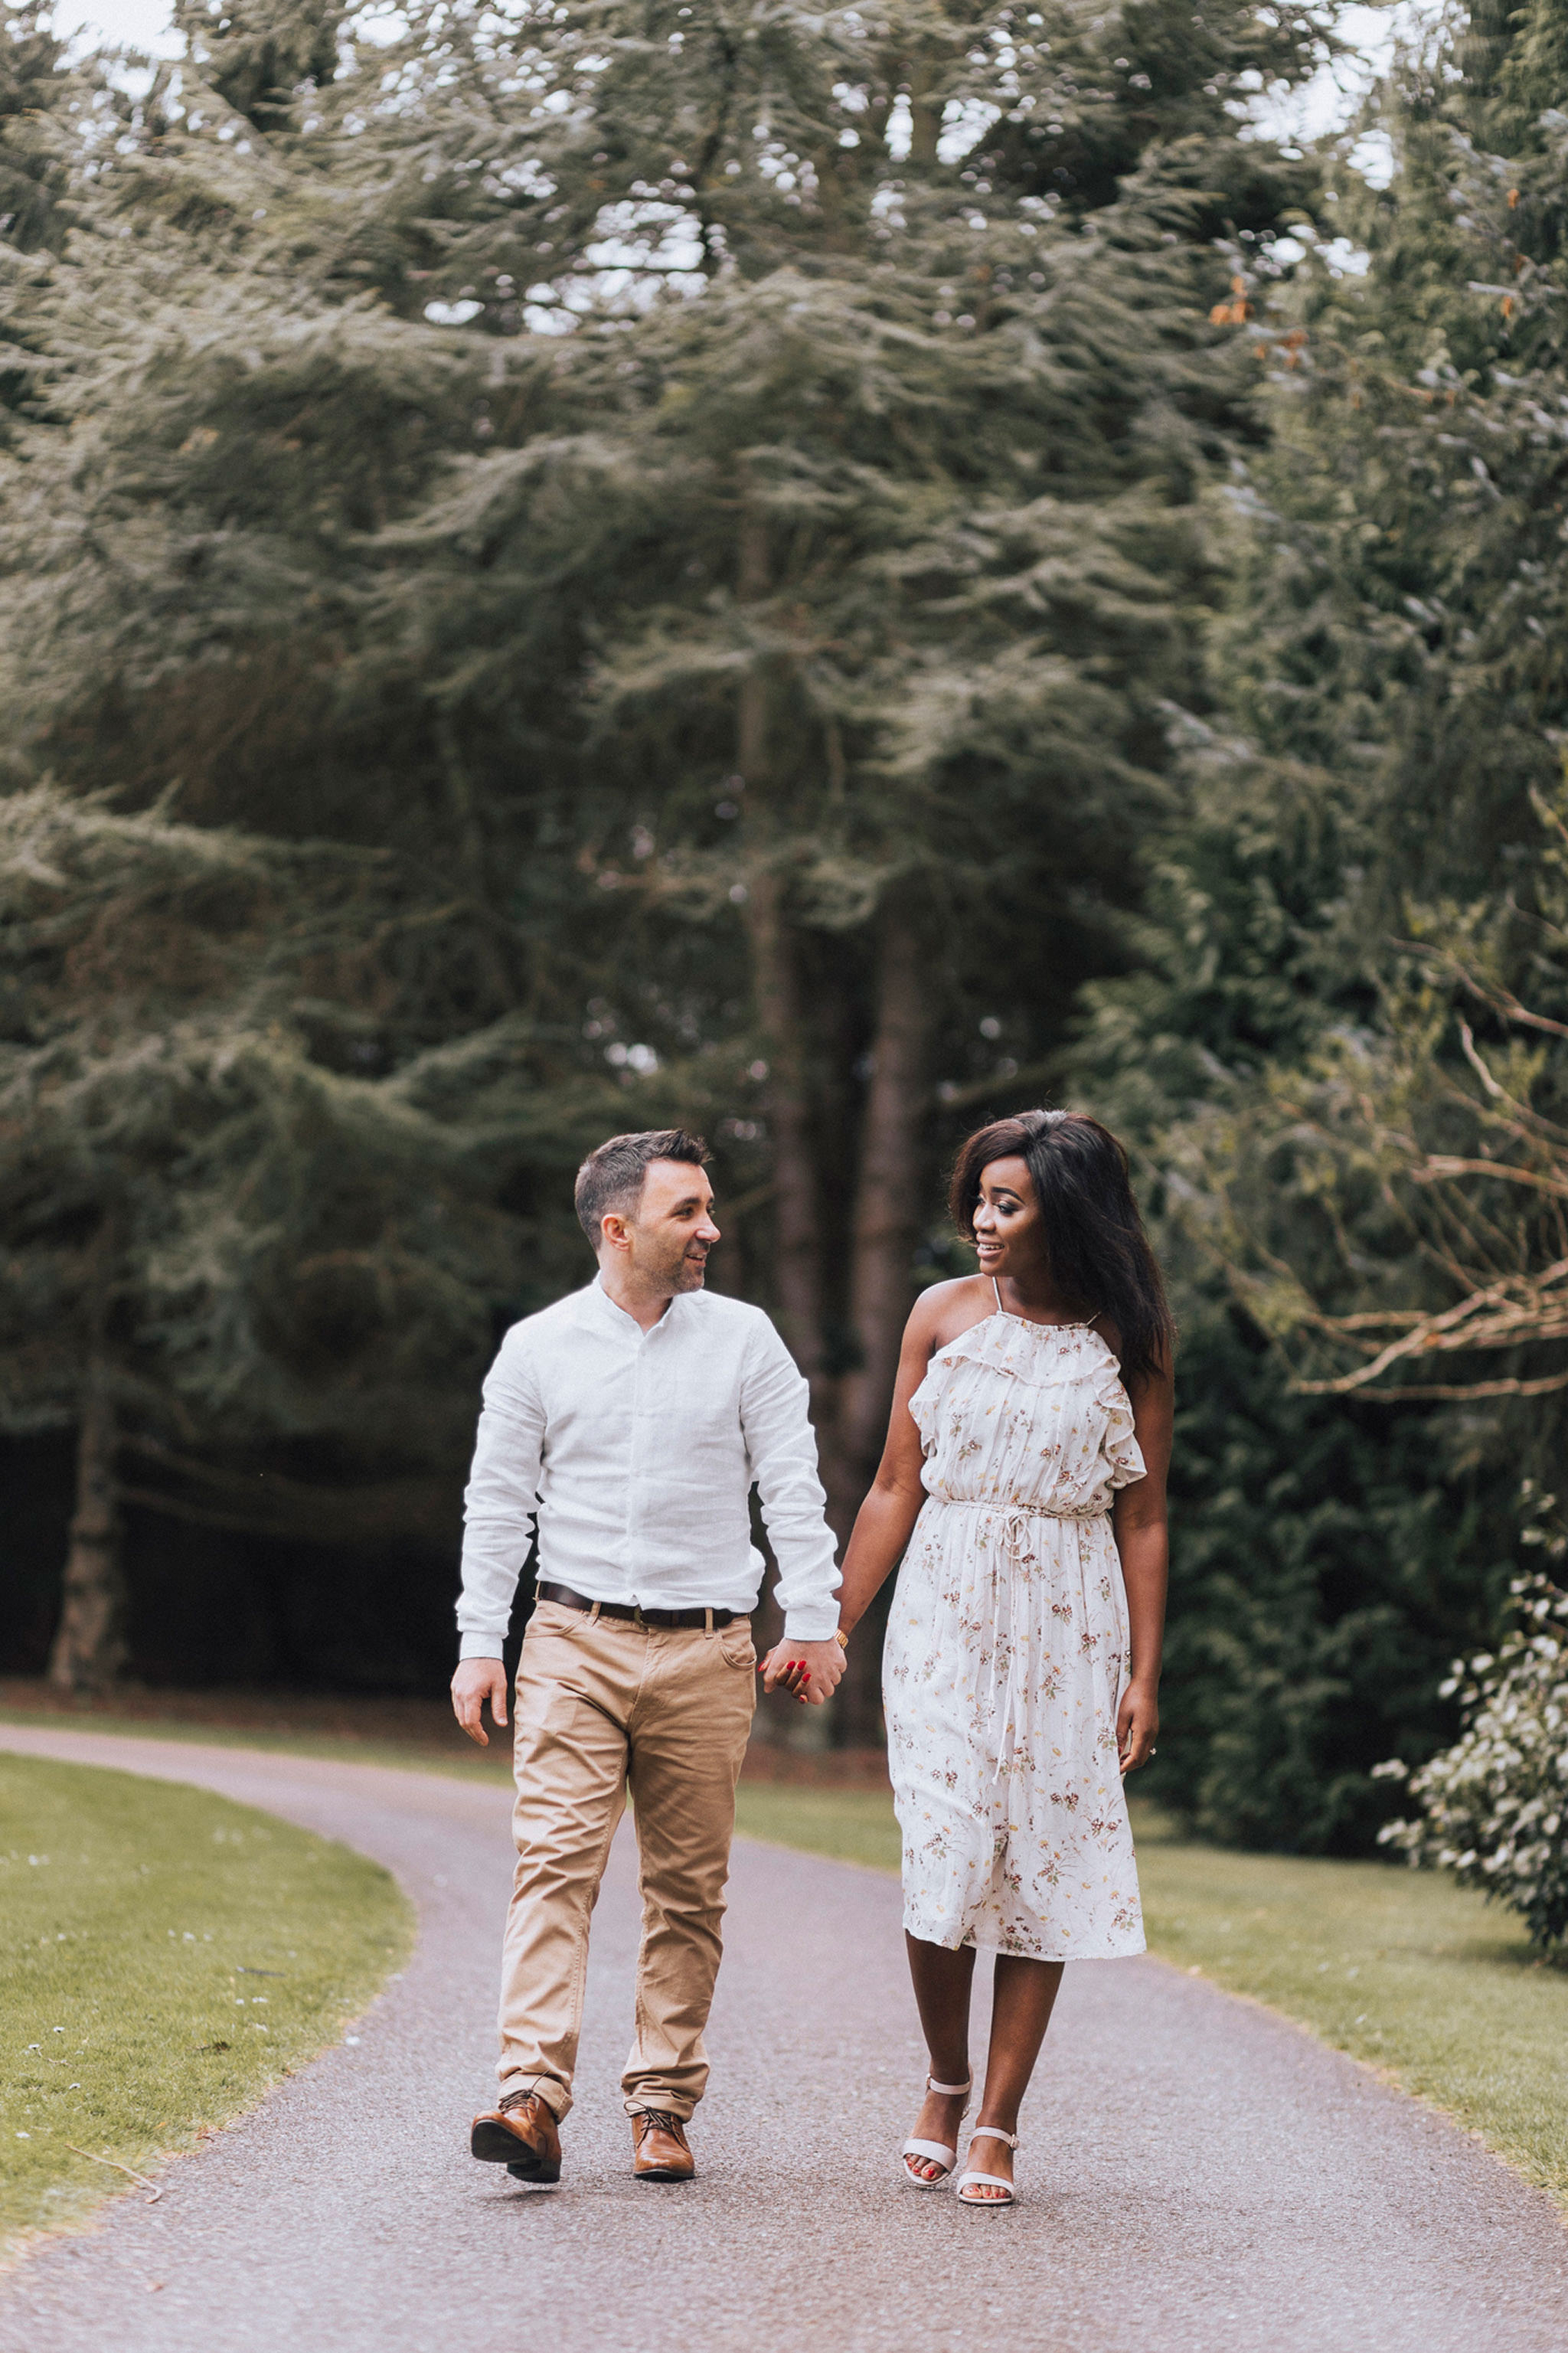 dundee-engagement-wedding-photographer-01.jpg